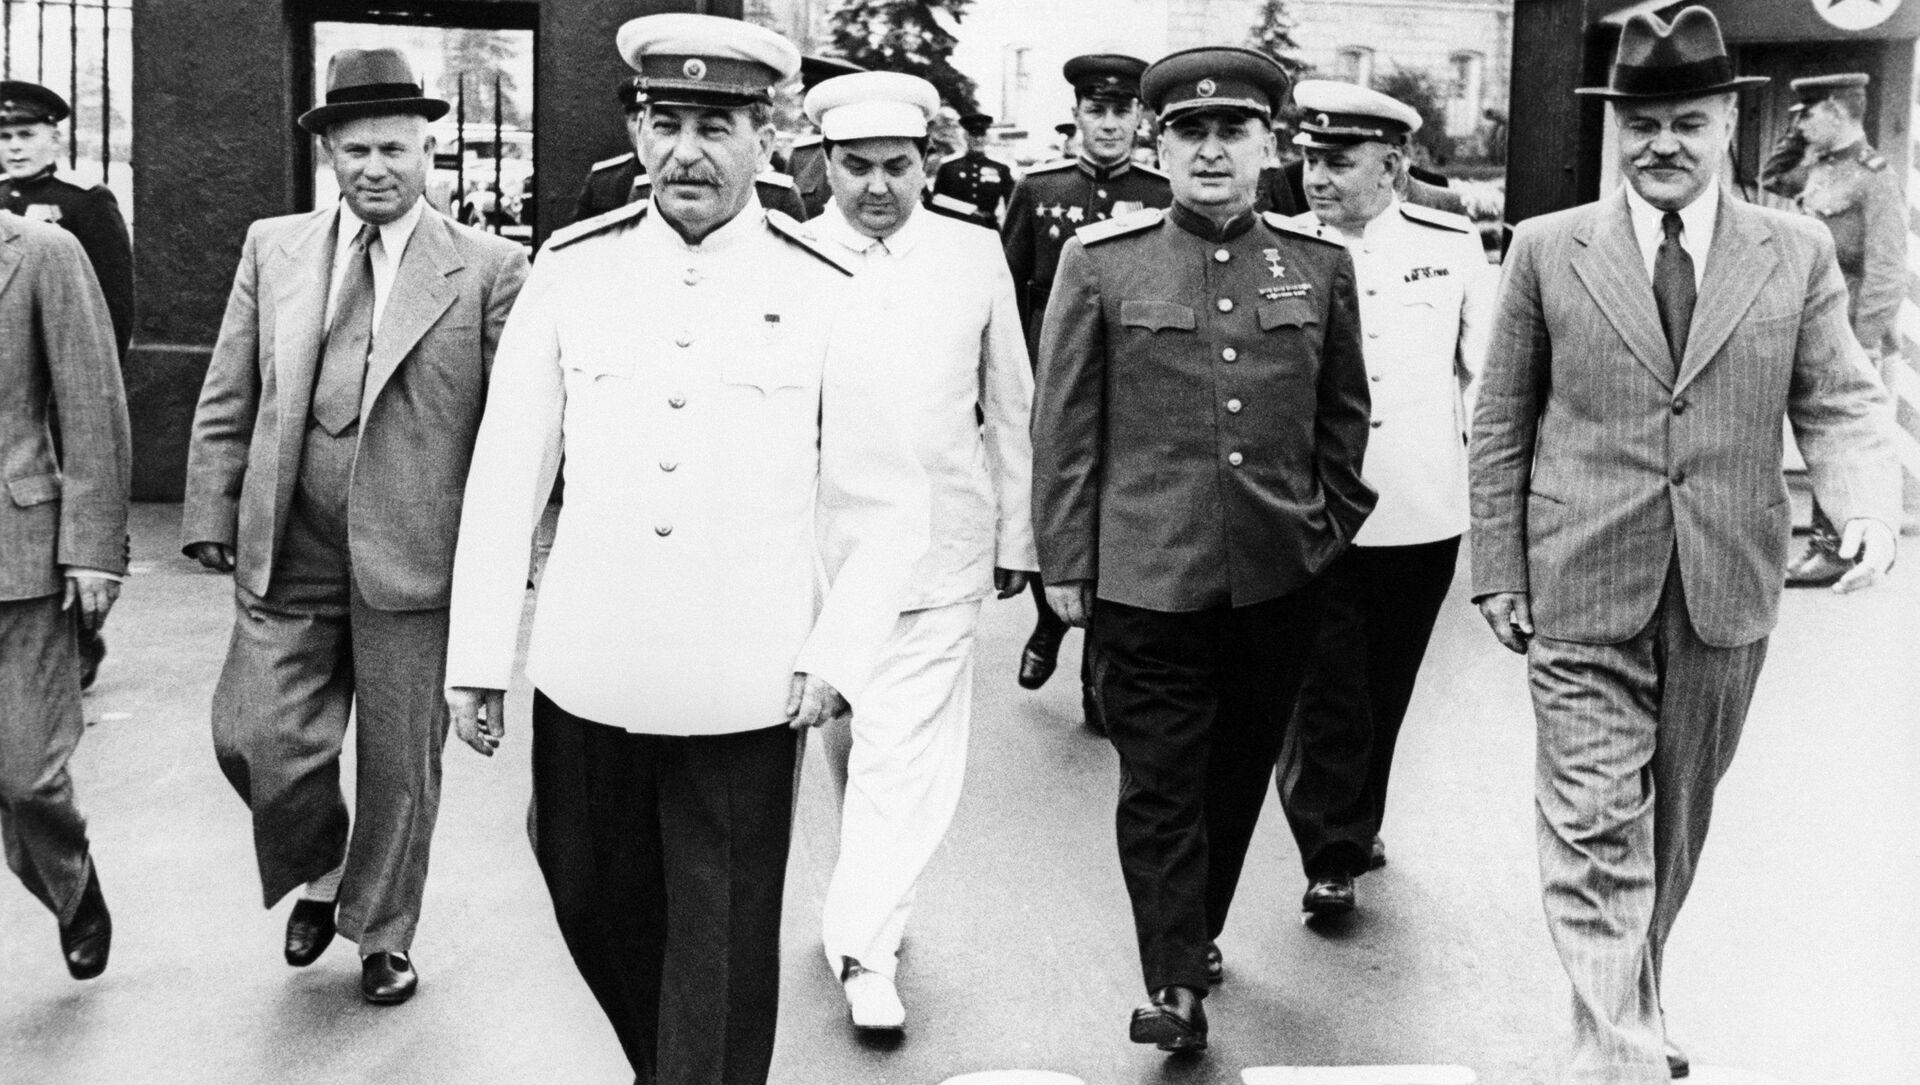 Nikita Khrushchev, Joseph Stalin, Georgy Malenkov, Lavrenty Beria, Vyacheslav Molotov (từ trái sang phải) đến Quảng trường Đỏ - Sputnik Việt Nam, 1920, 02.07.2021